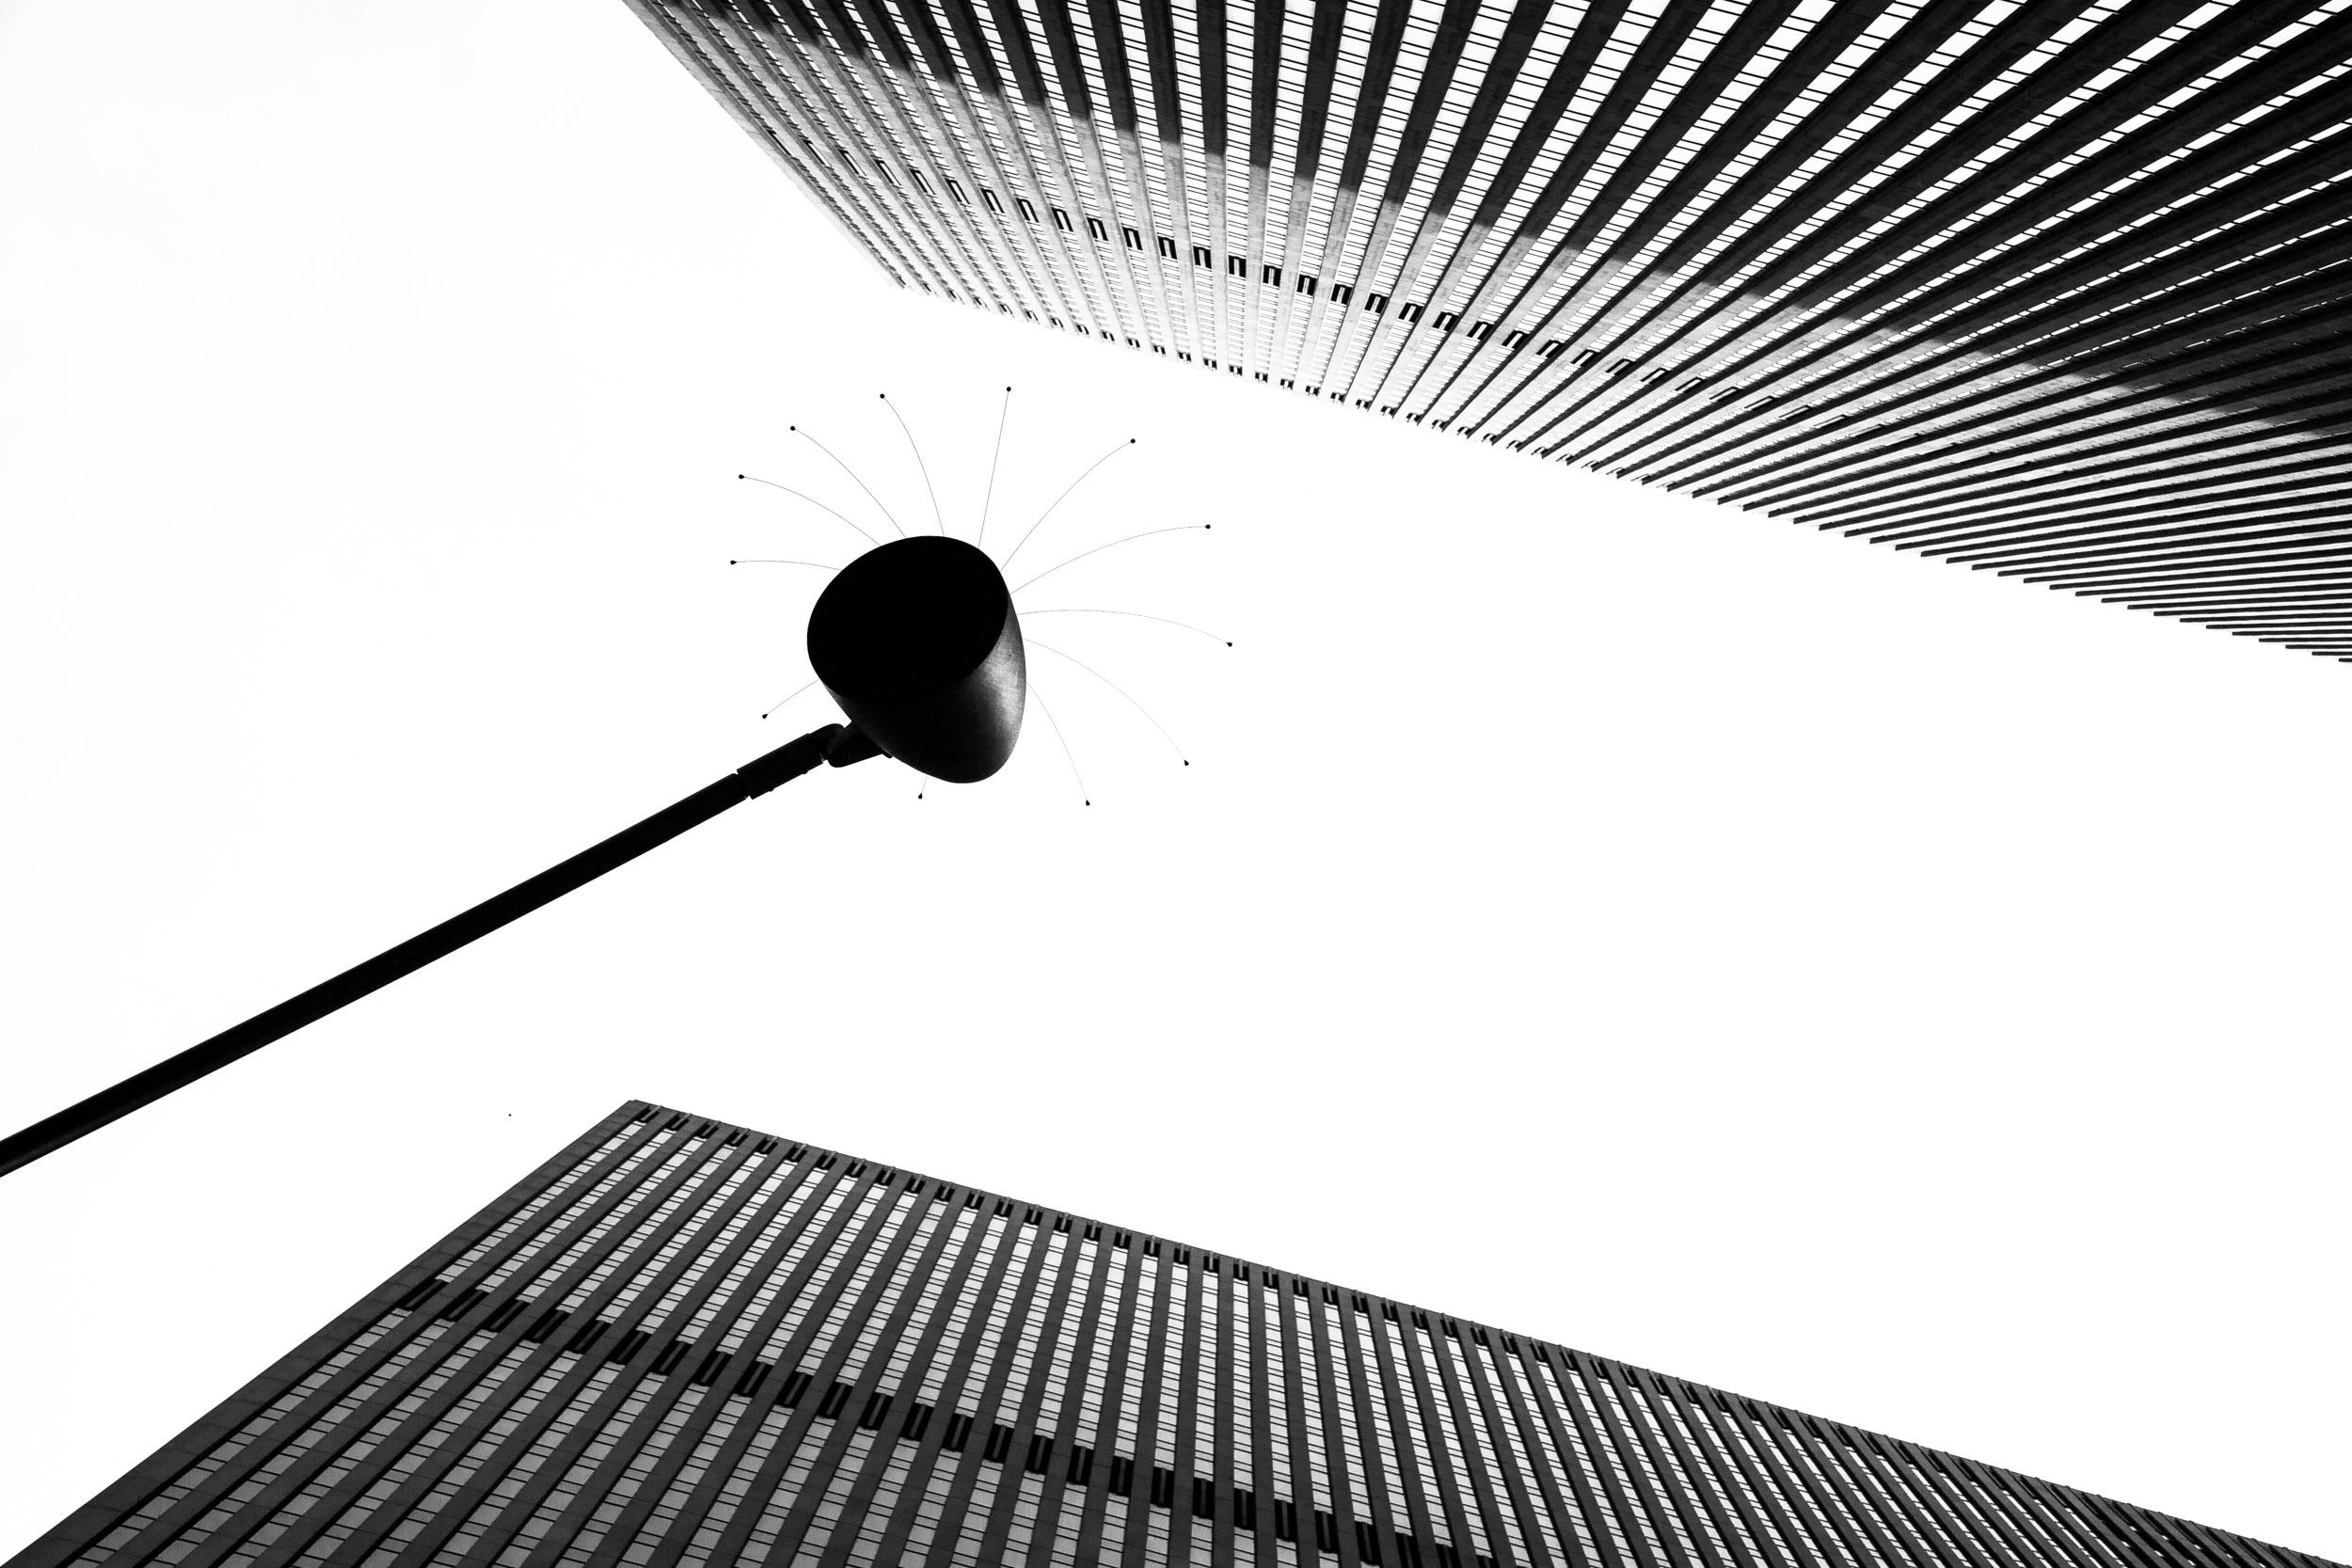 Streetlights of New York #38 New York, NY 2010